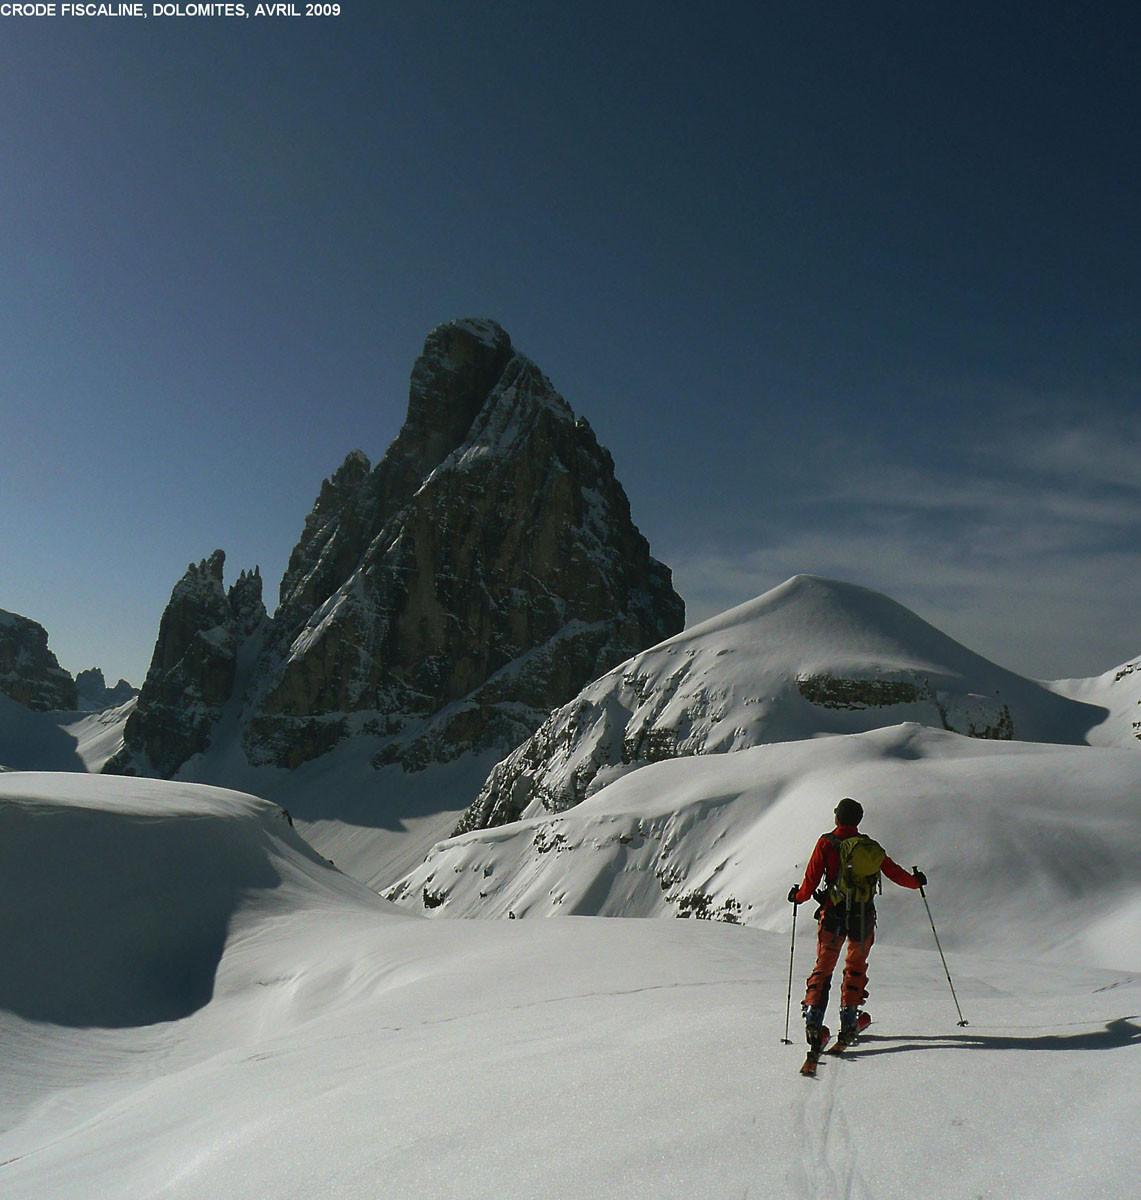 Zwölferkofel (Dolomites de Sesto), en montant vers les Crode Fiscaline